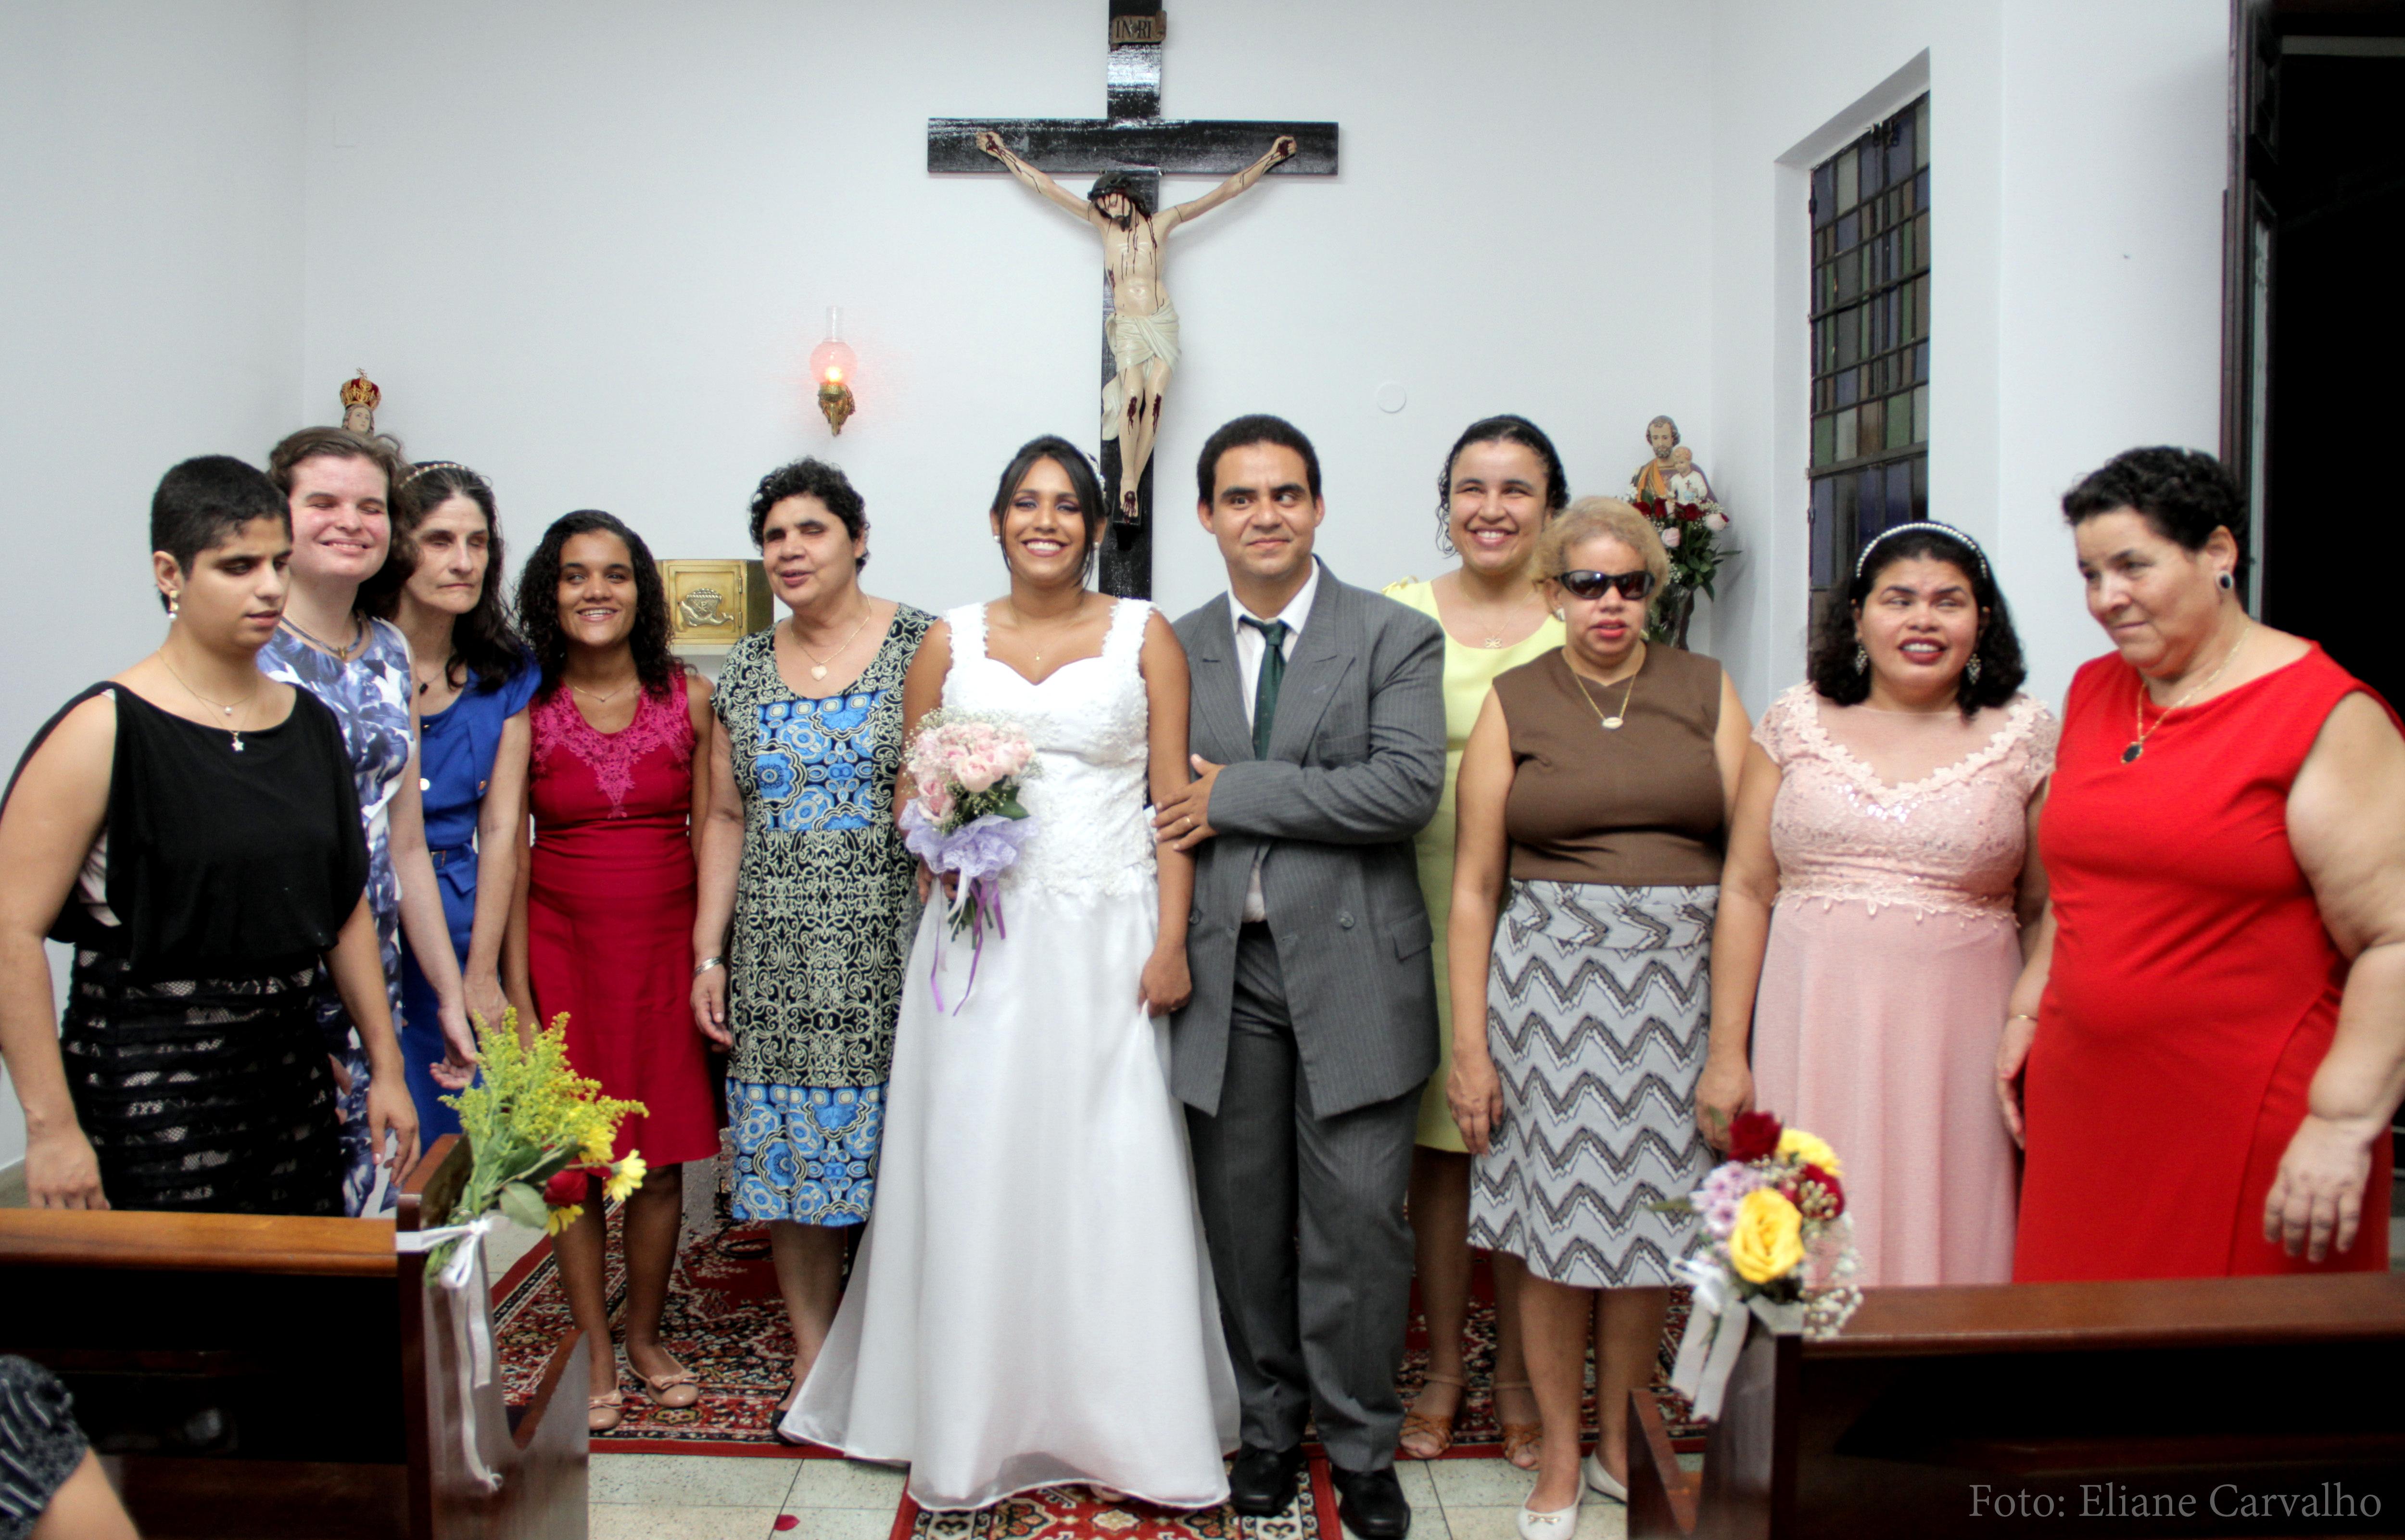 GoogleDrive_Casamento-de-Jackciane-Aercio_jpg-60